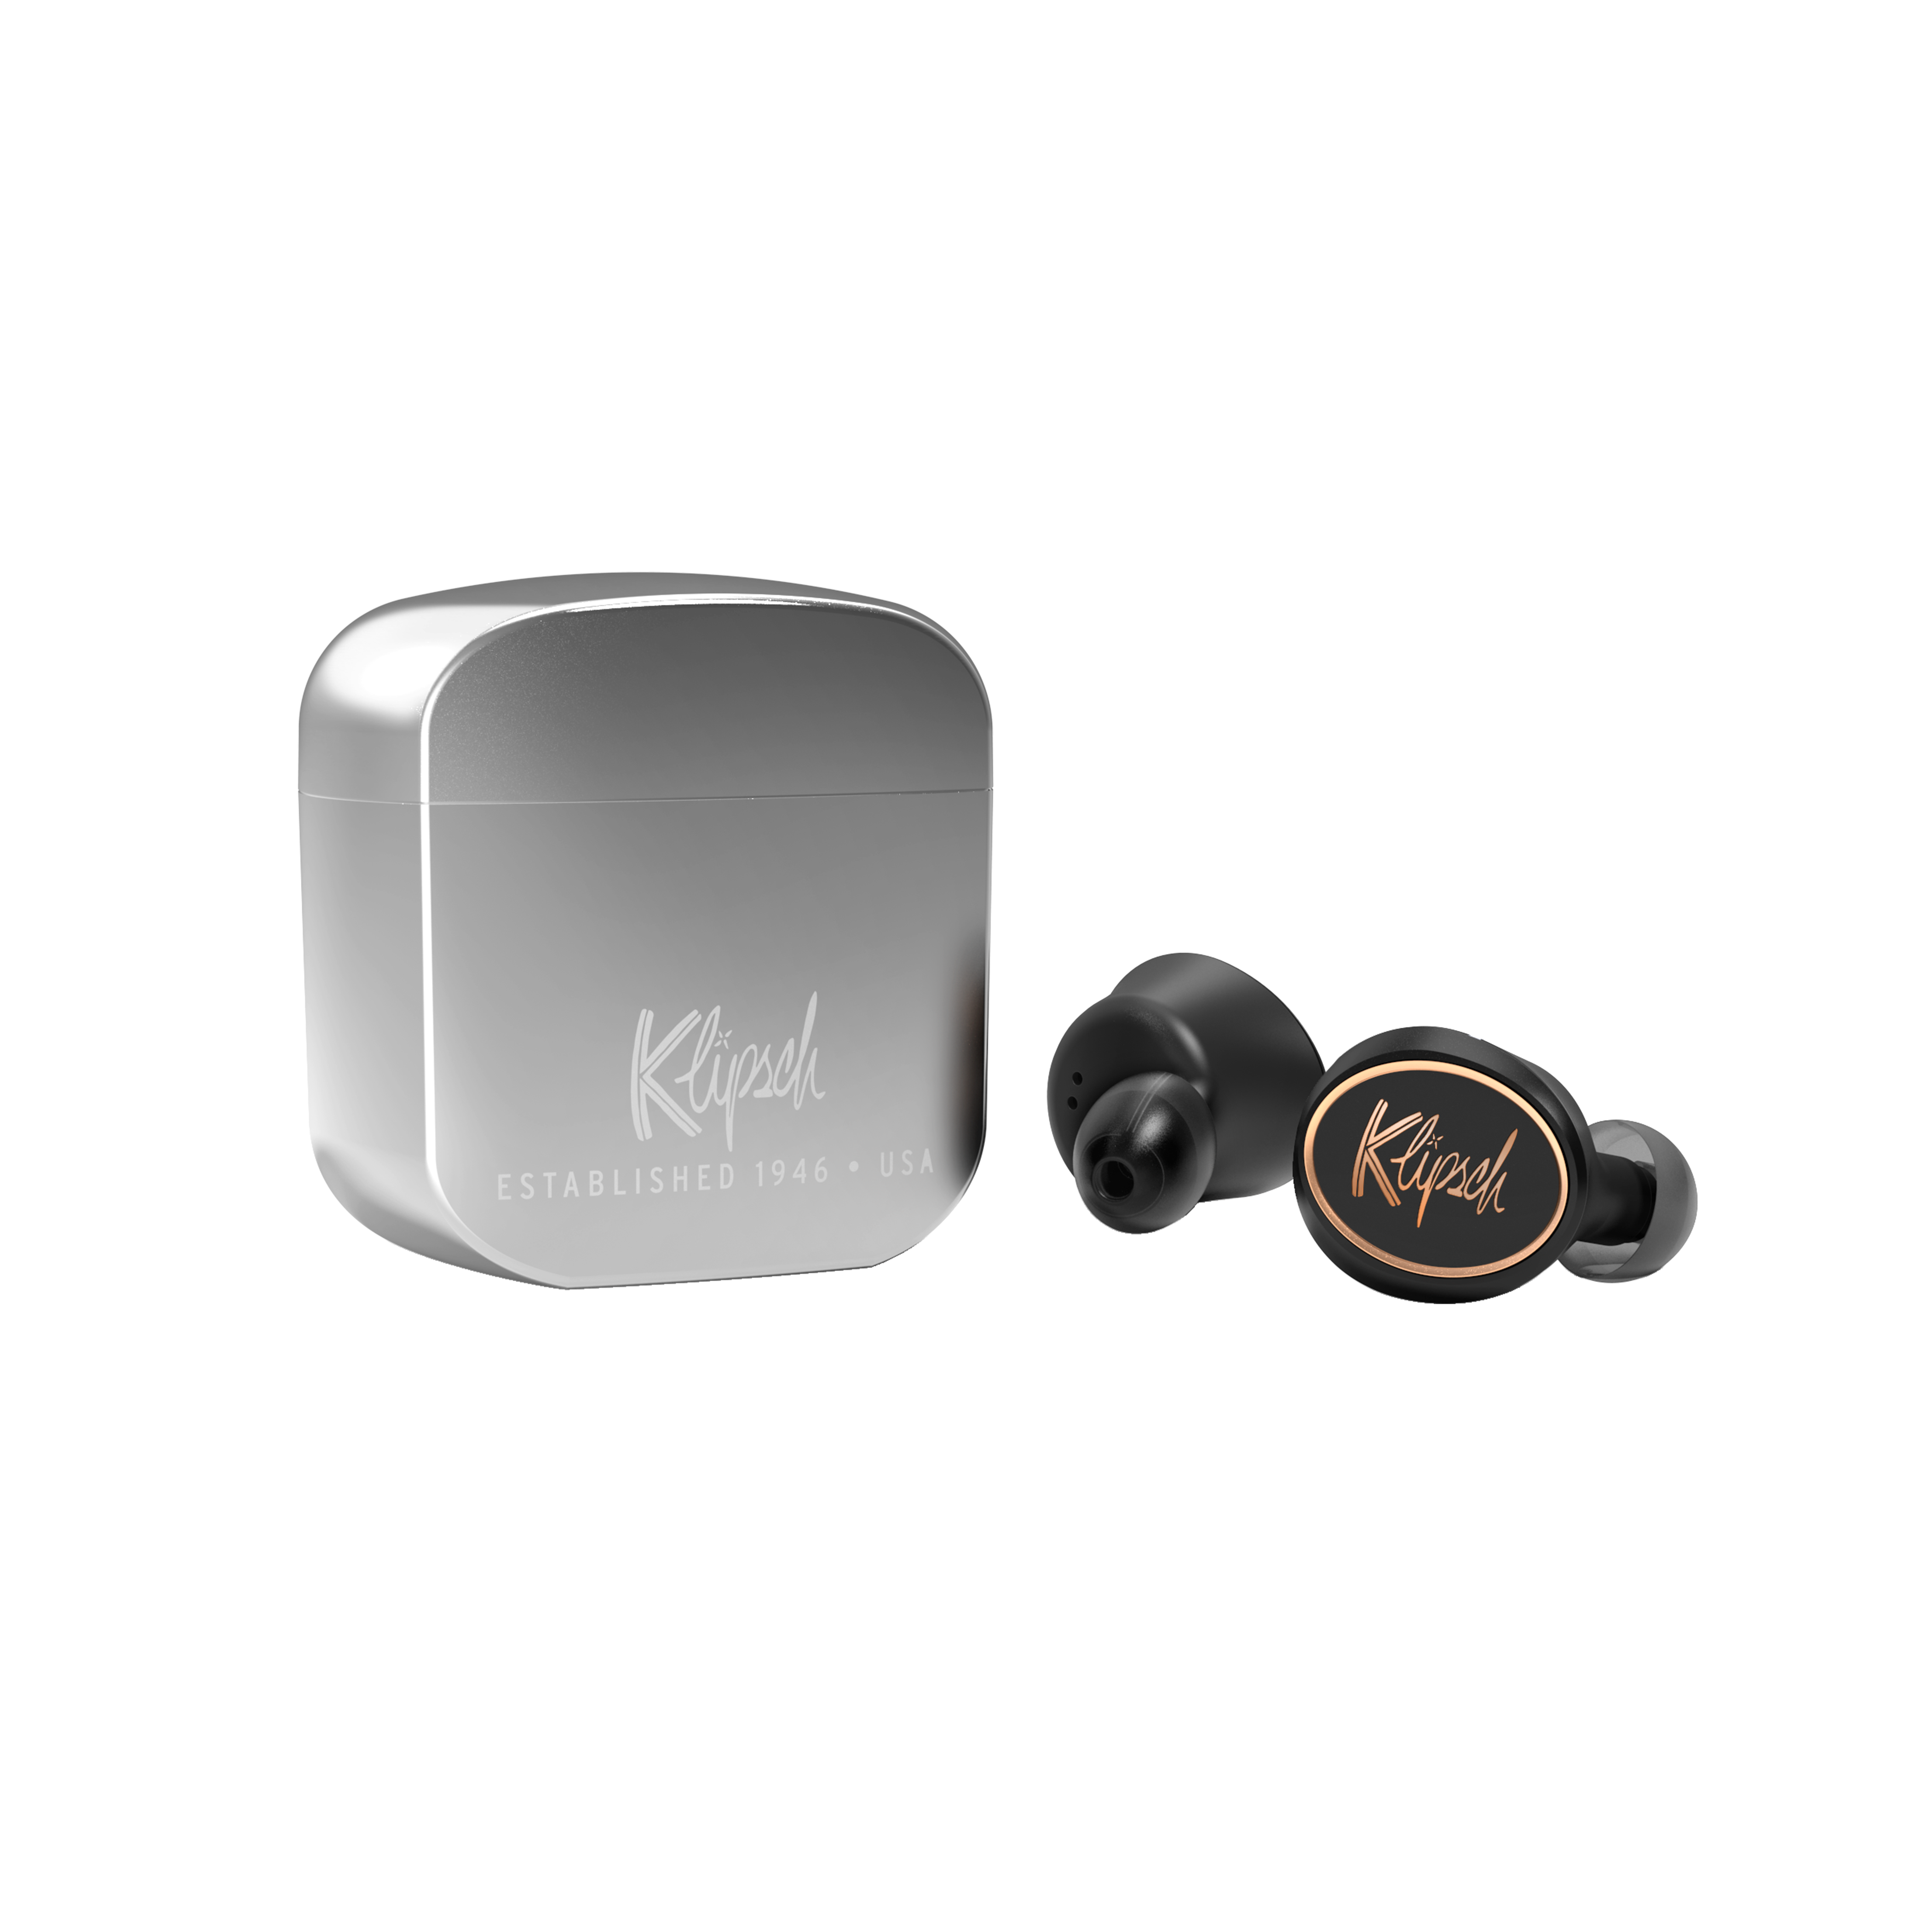 Best Wireless Headphones Noise Cancelling In 2020 Wireless Headphones Wireless Earbuds Klipsch